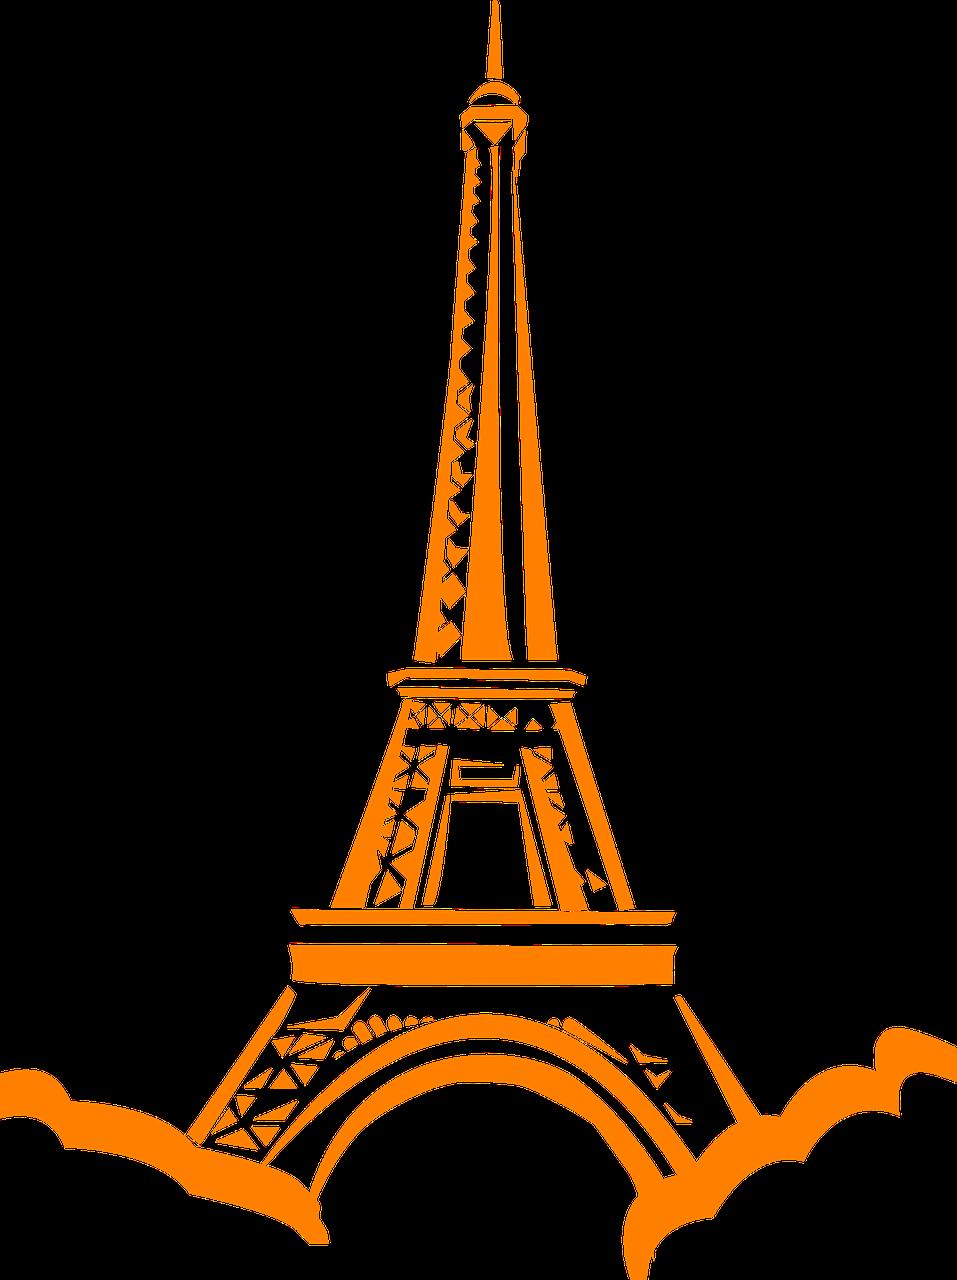 France, Eiffel, Tower, Paris, Landmark, France #france.